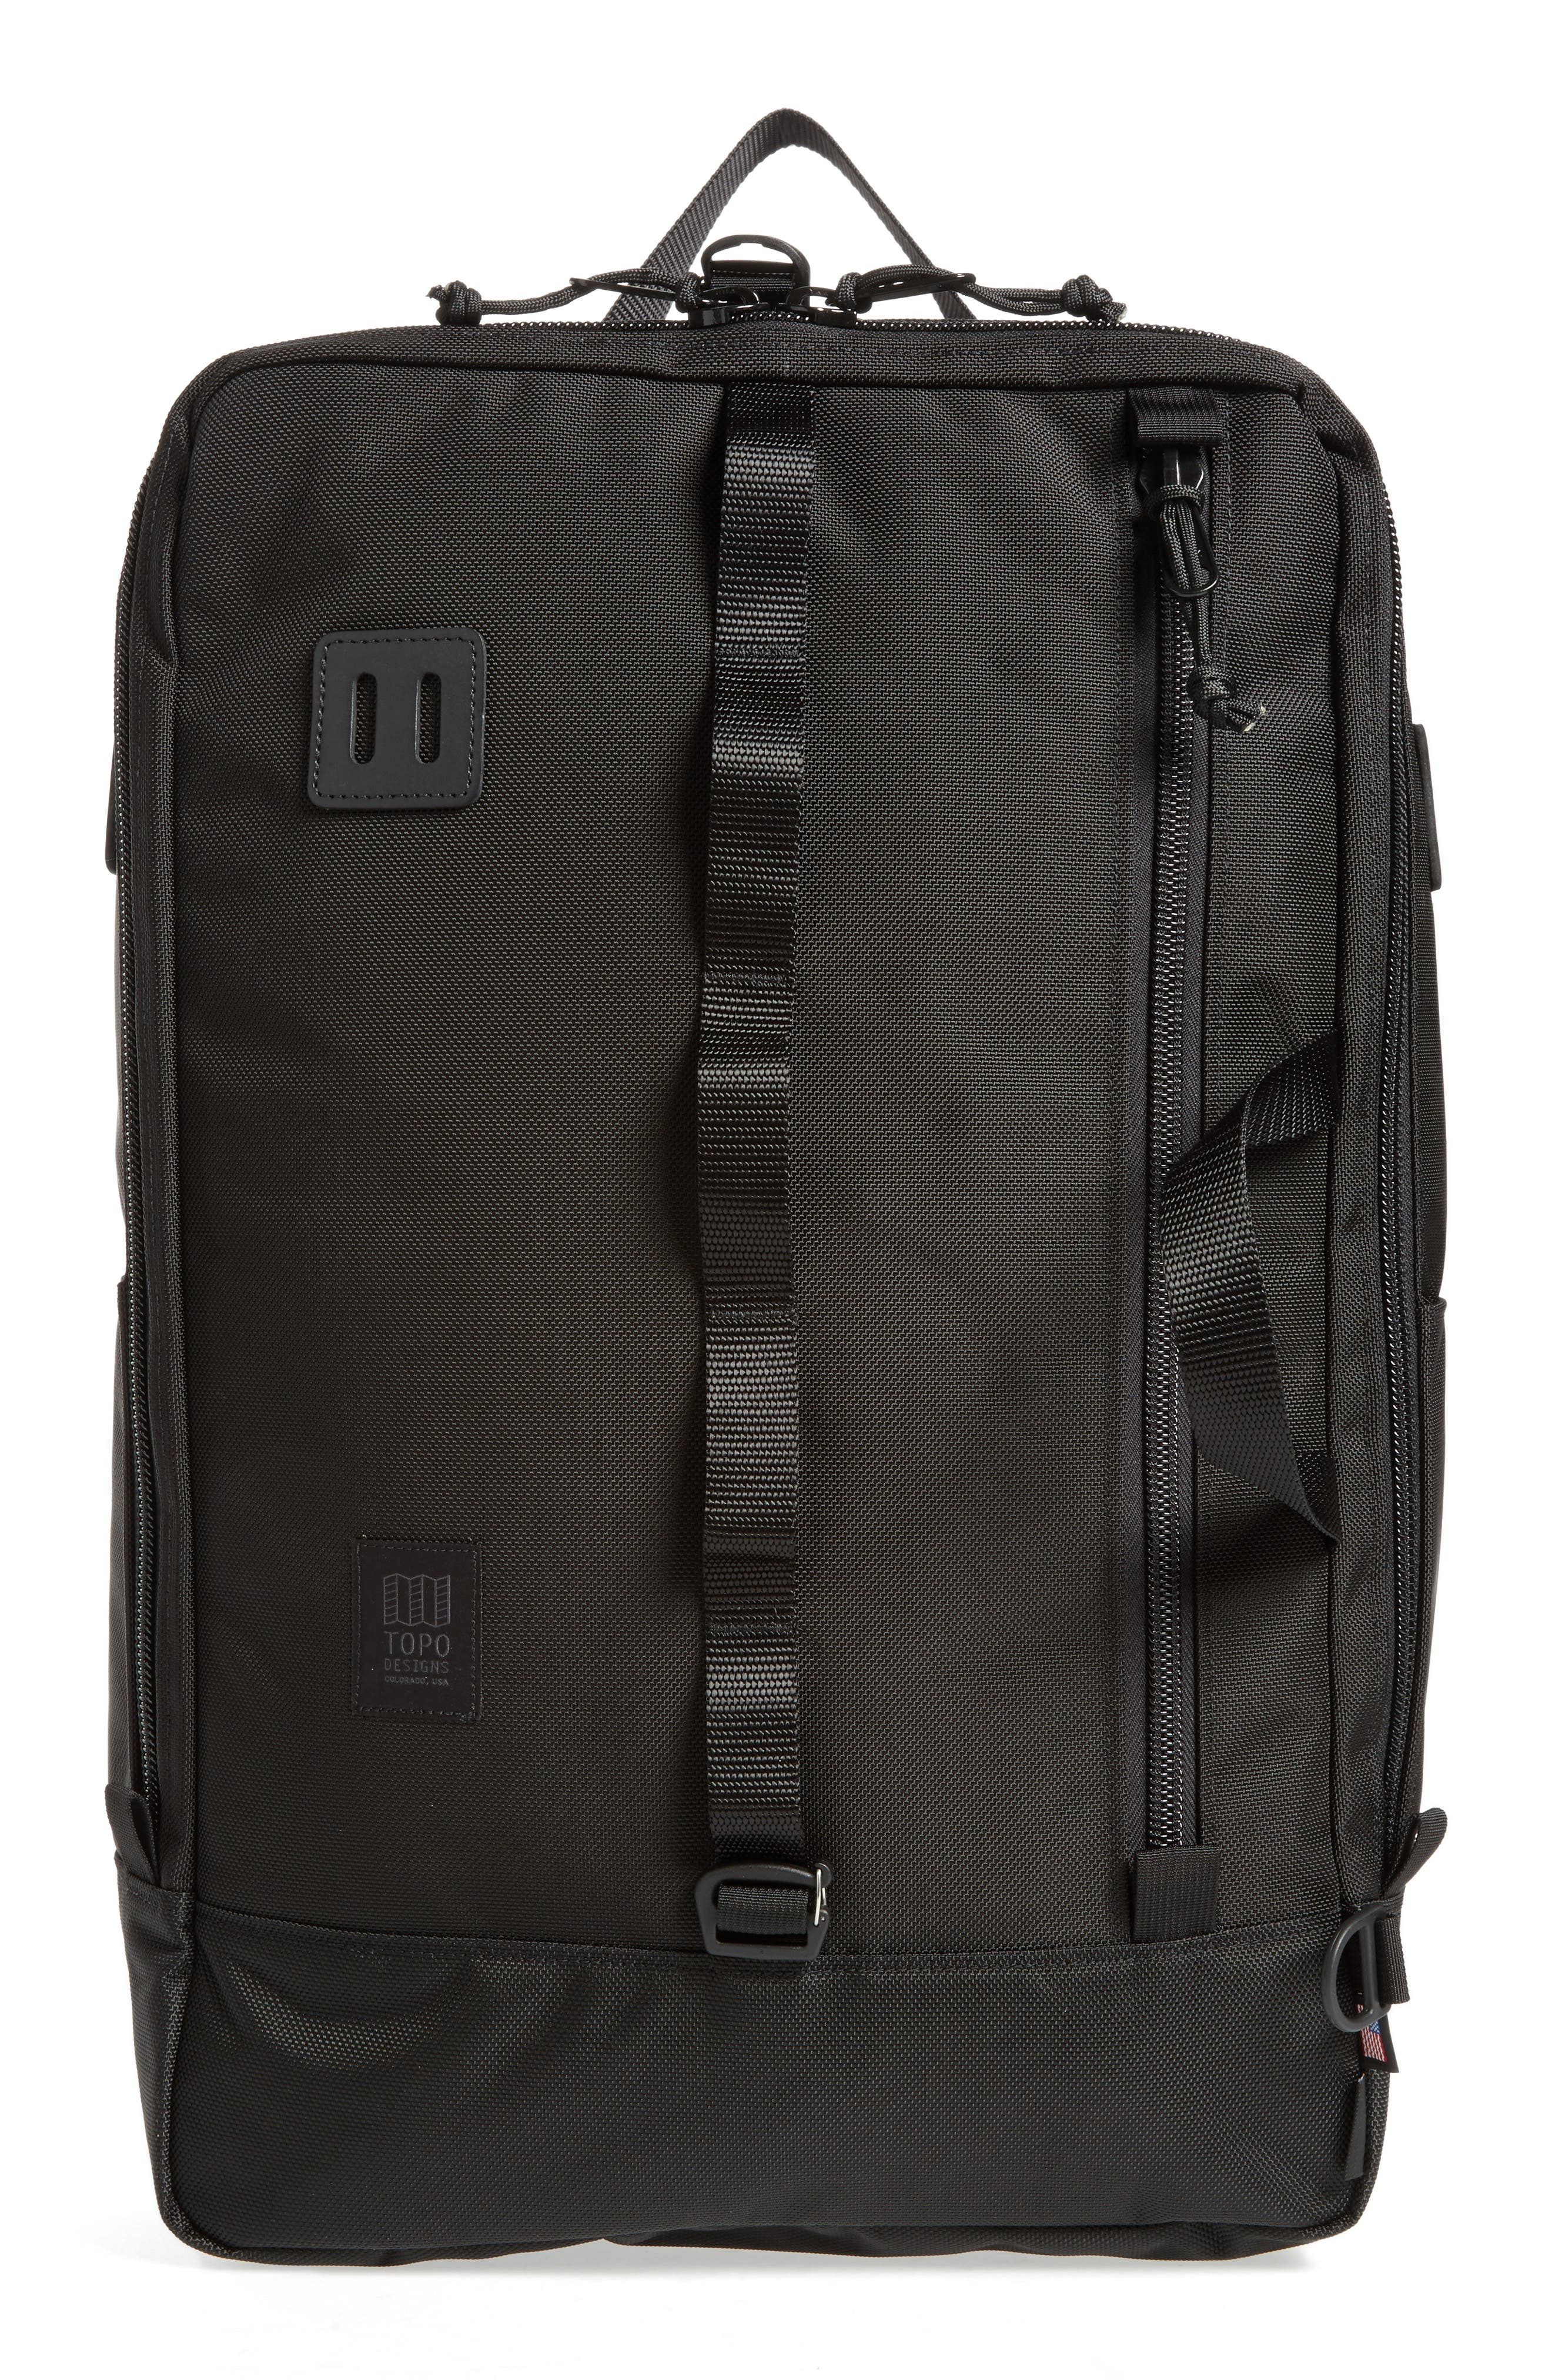 Alternate Image 1 Selected - Topo Designs Travel Backpack